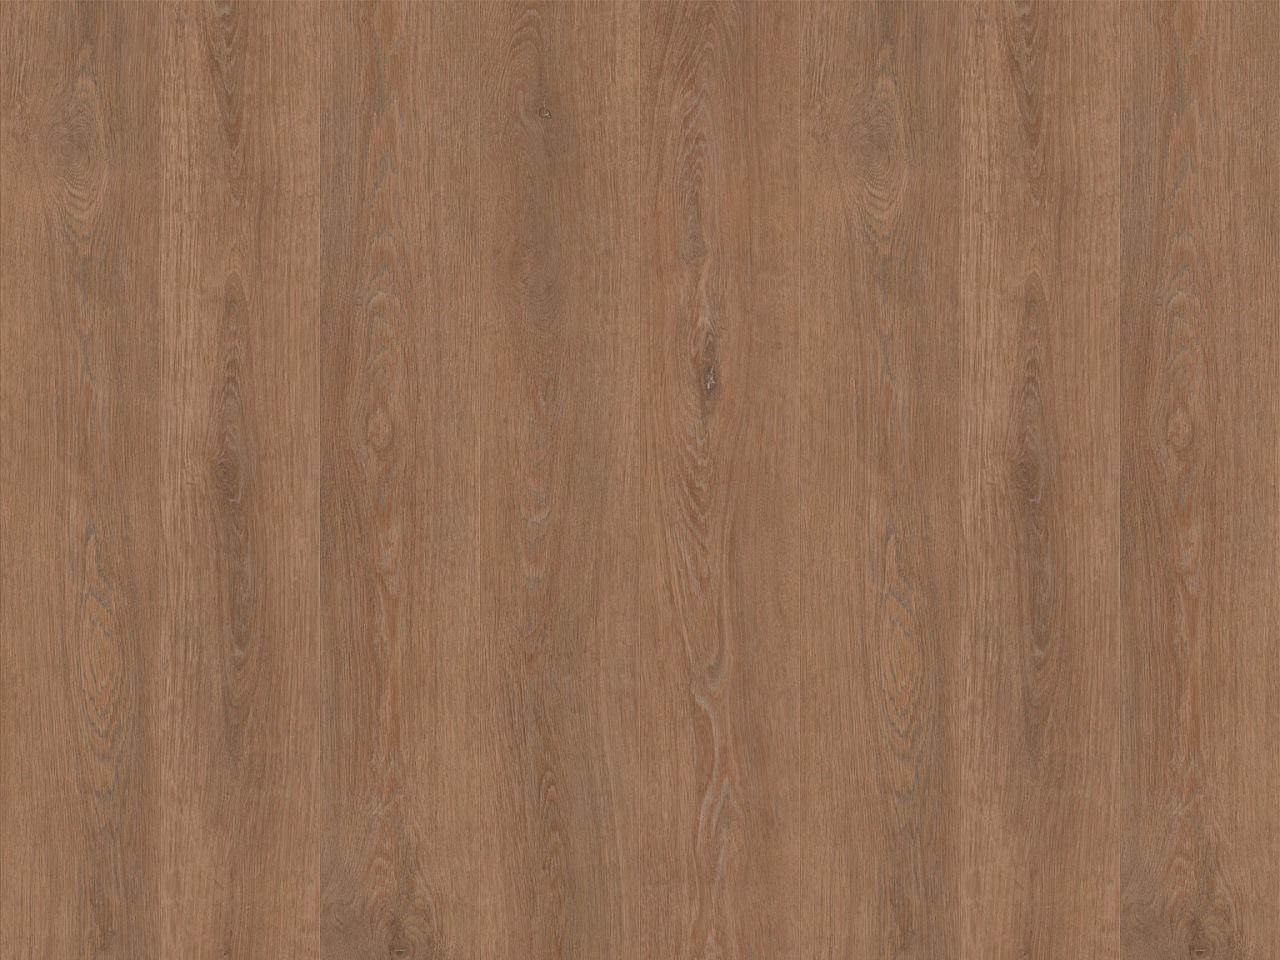 Designbelag Rico wood – Eiche Almere, 328006